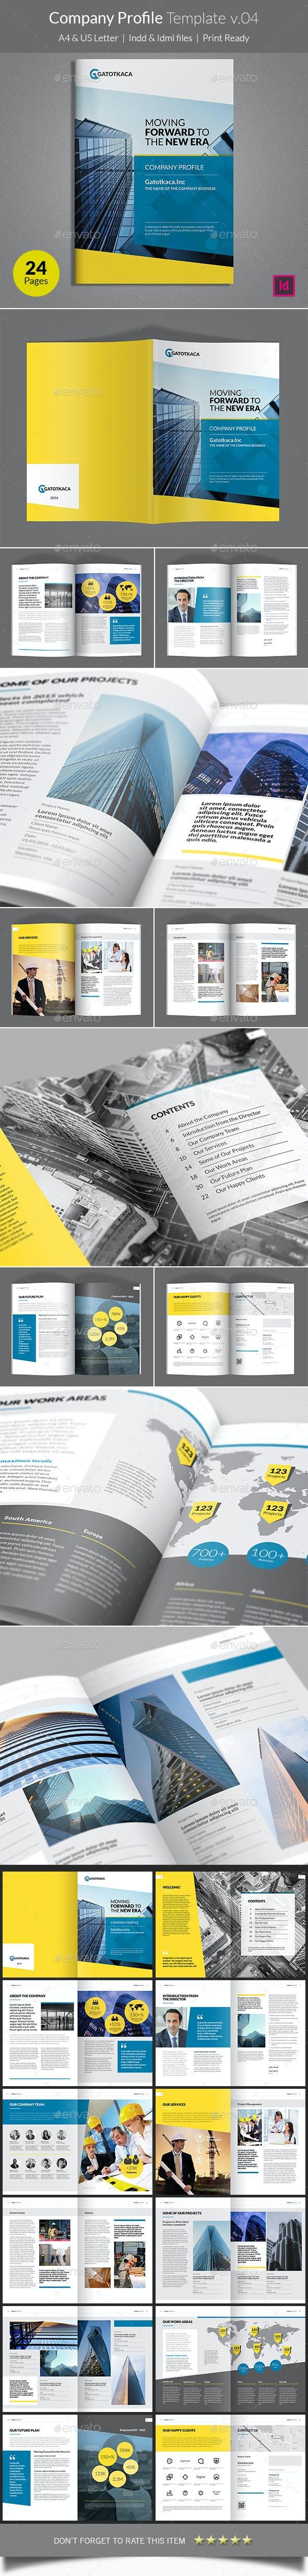 Company Profile Template v04 - Corporate Brochures